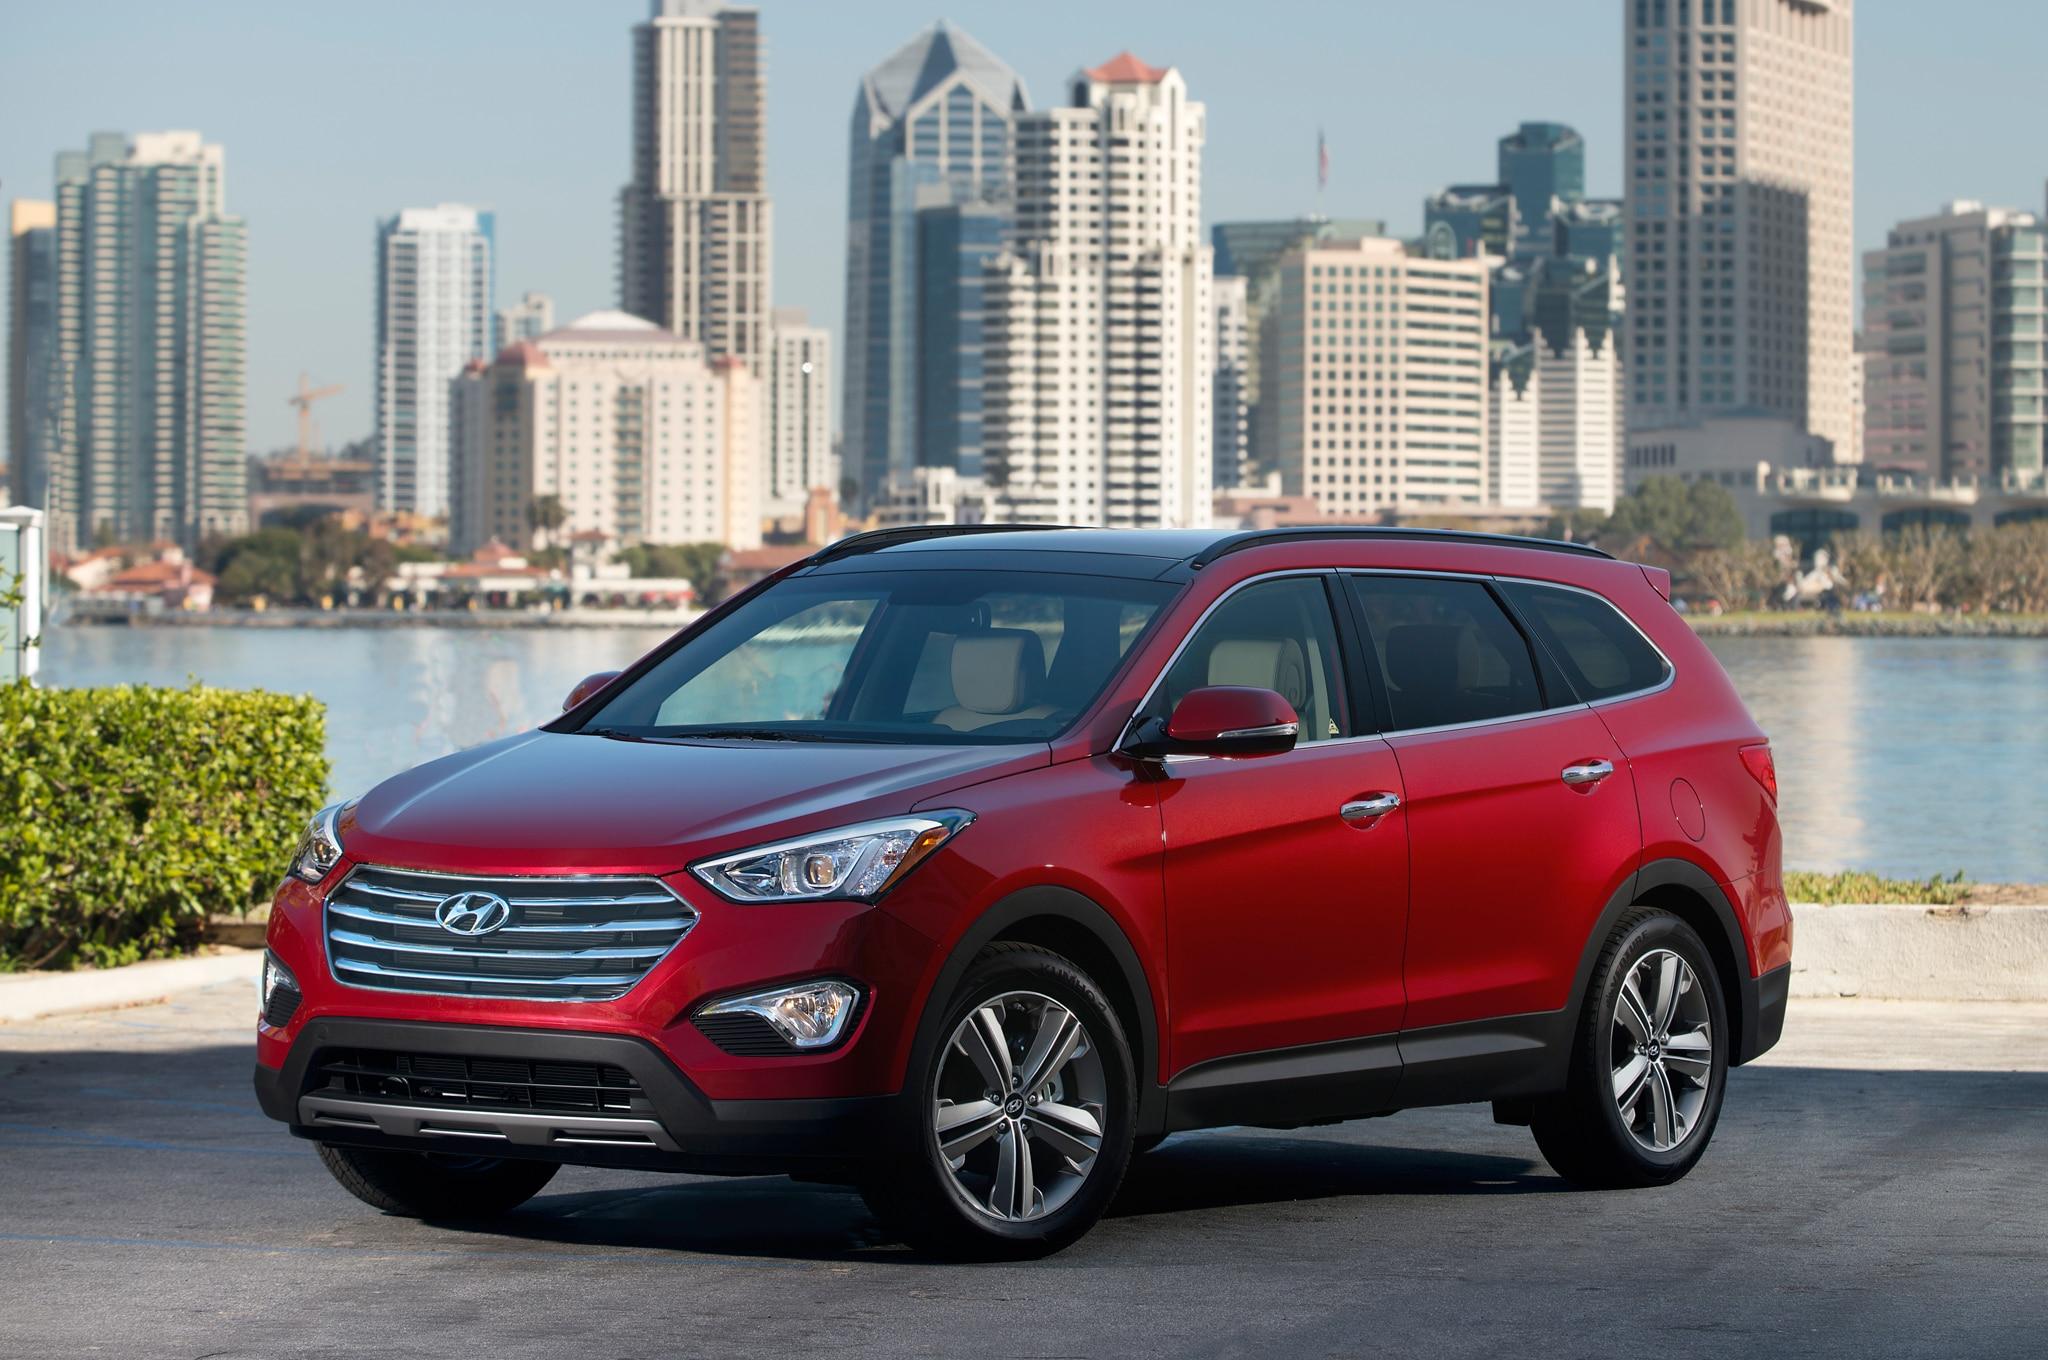 2014 Hyundai Santa Fe Front1